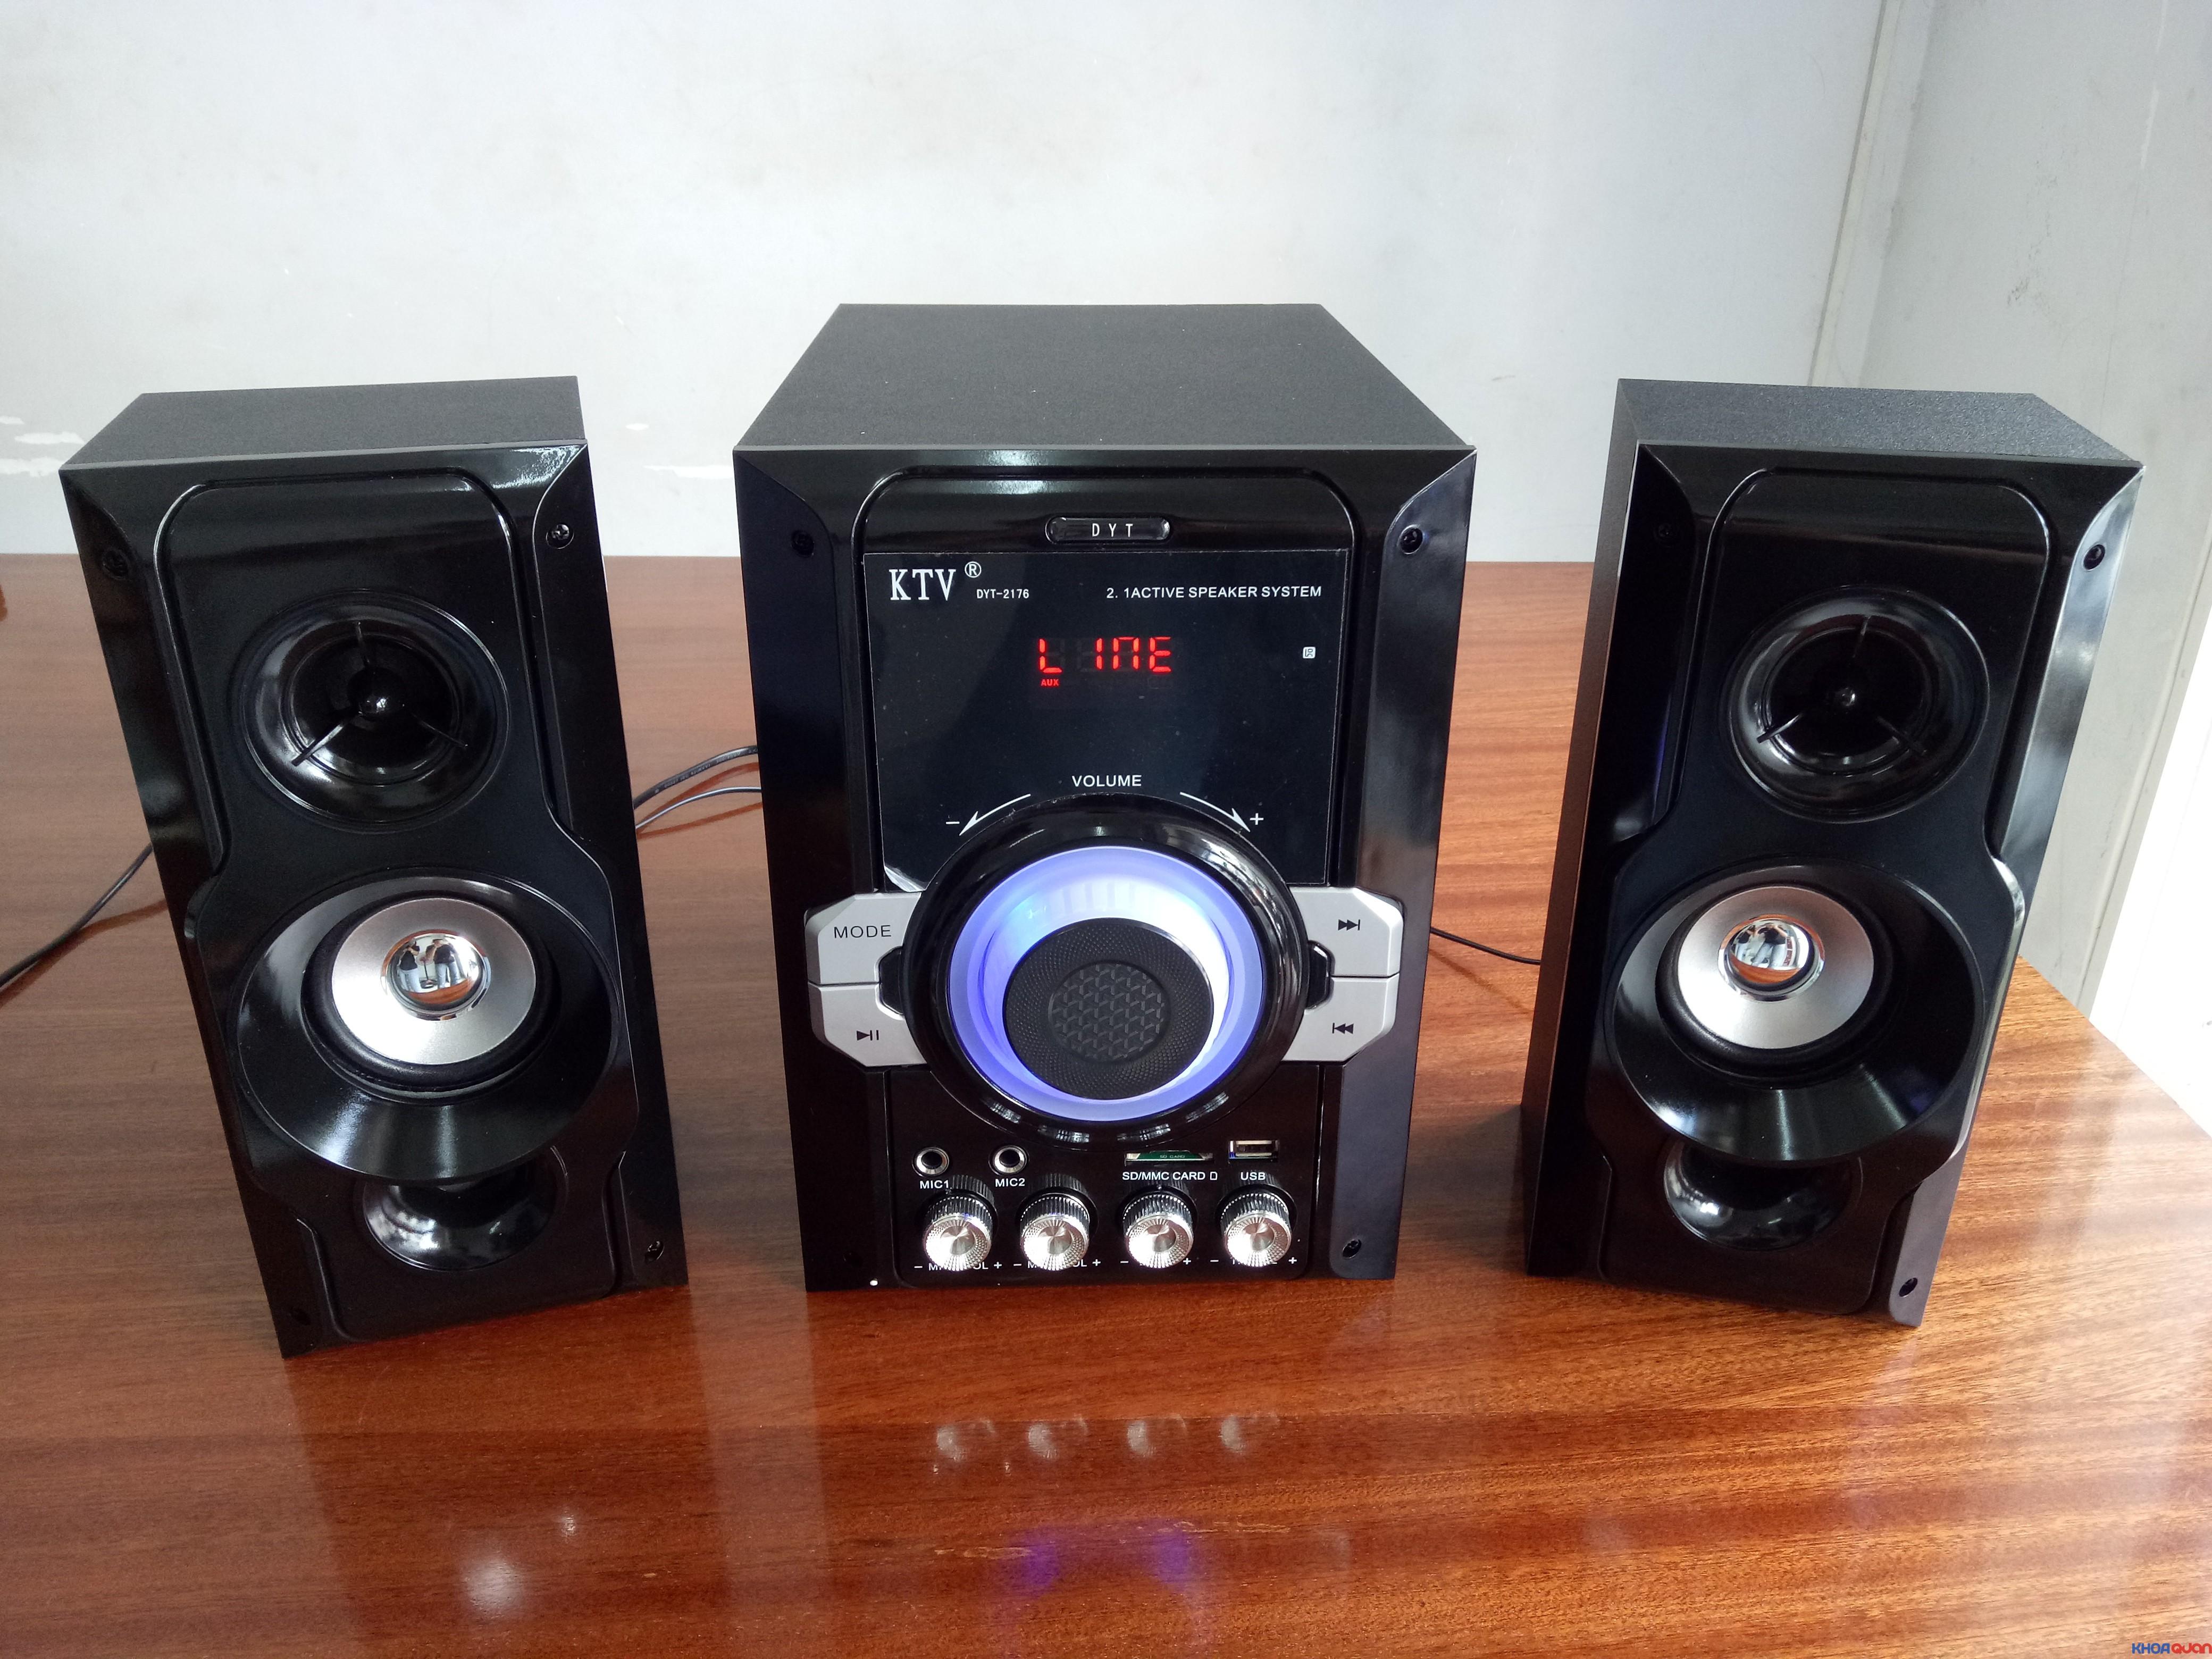 loa-vi-tinh-ktv-2-1-1